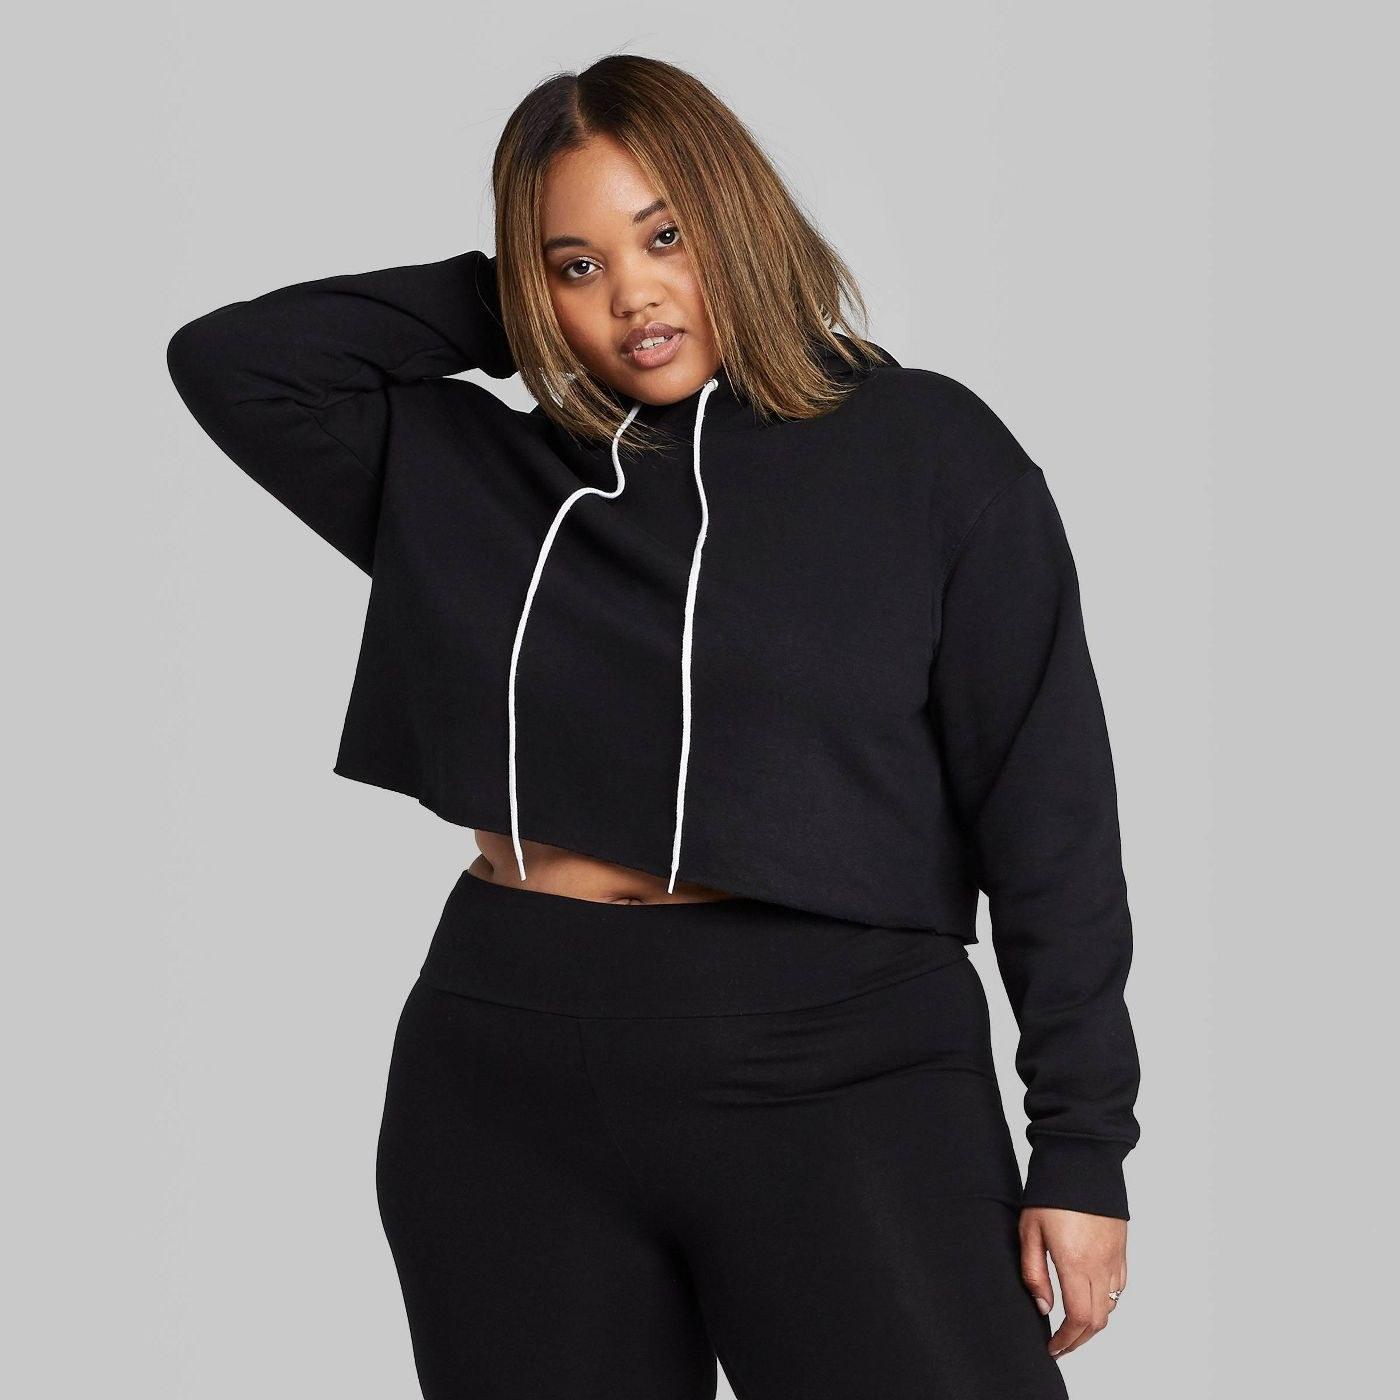 A model wearing a black cropped hoodie